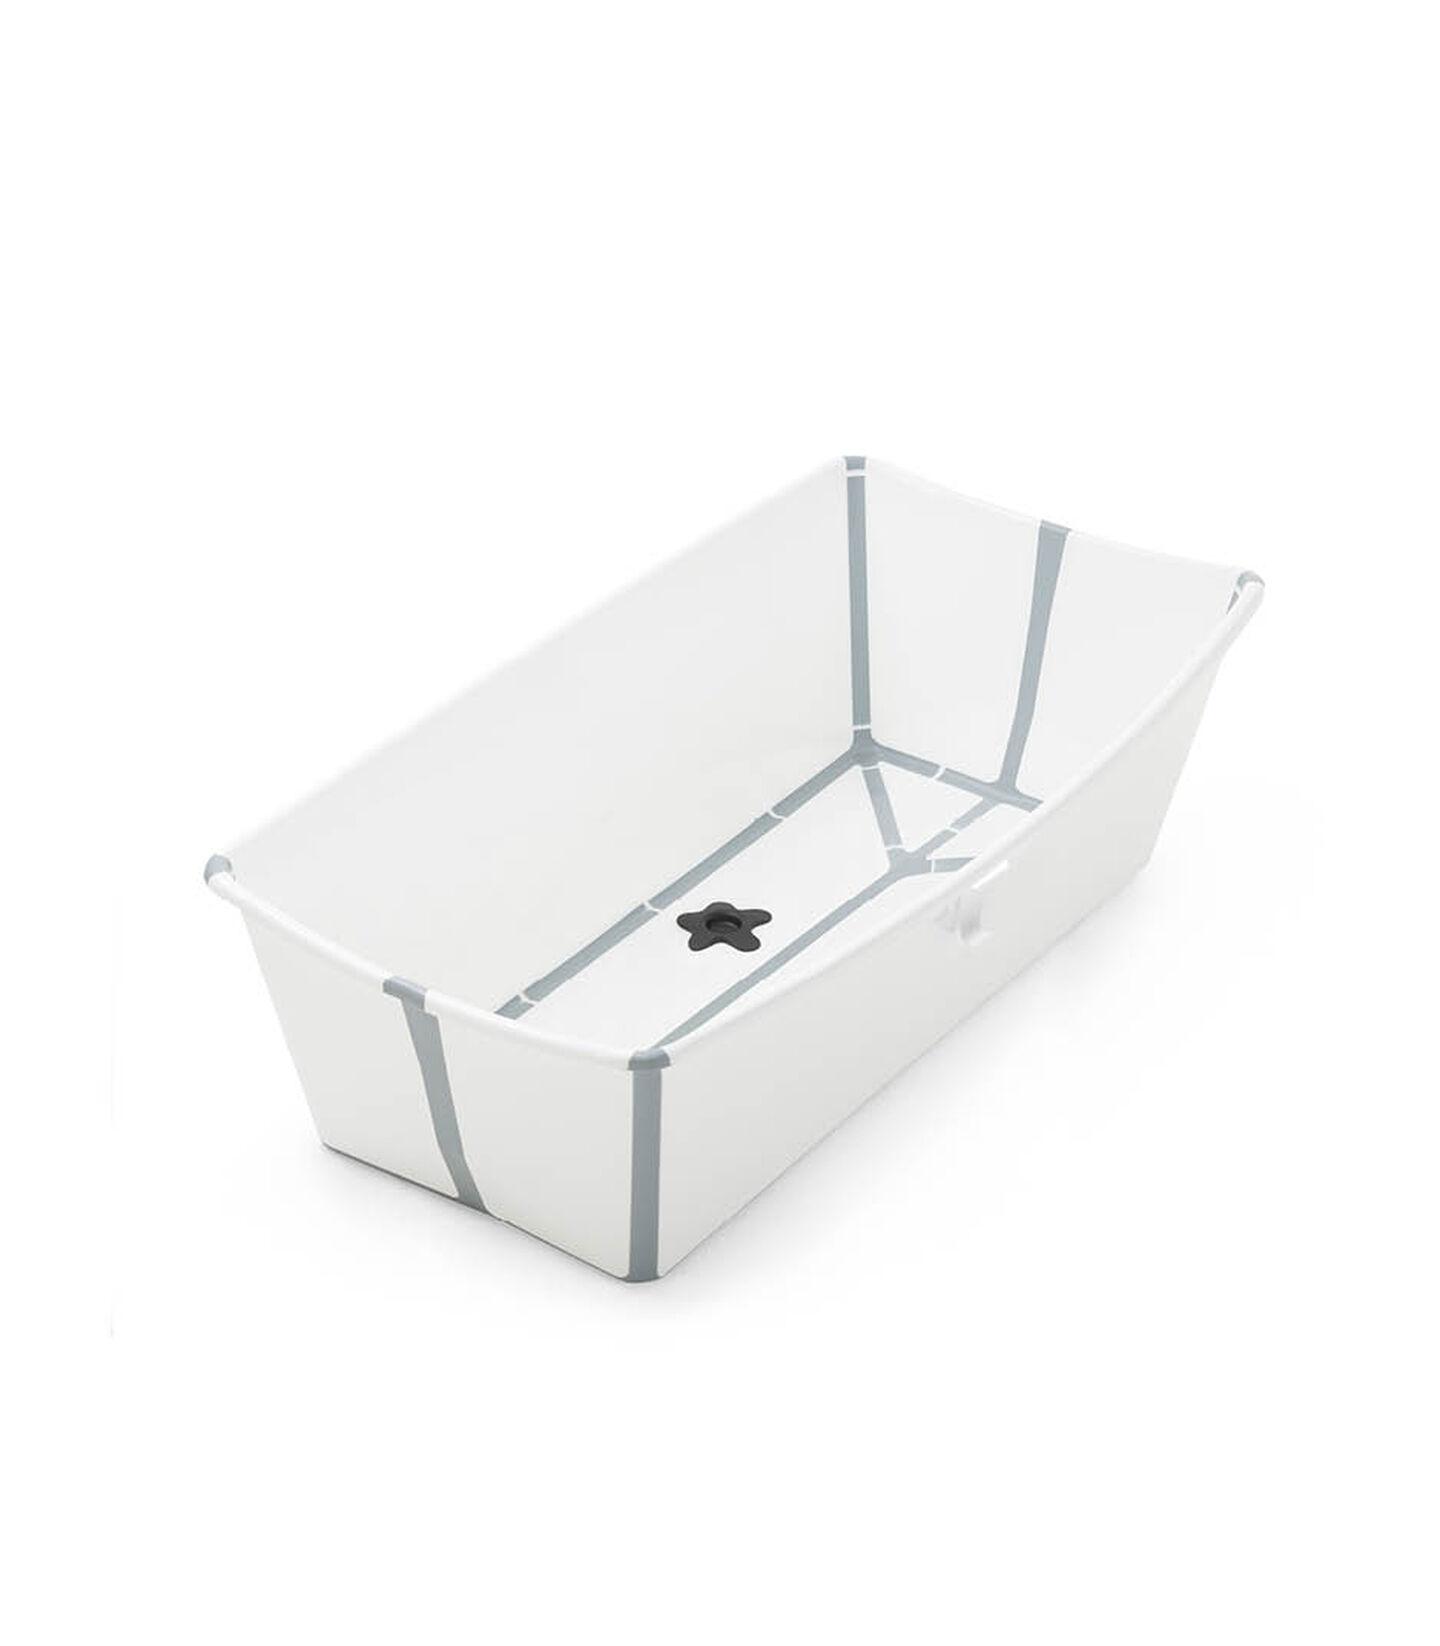 Stokke® Flexi Bath ® Large Transparent White, White, mainview view 1